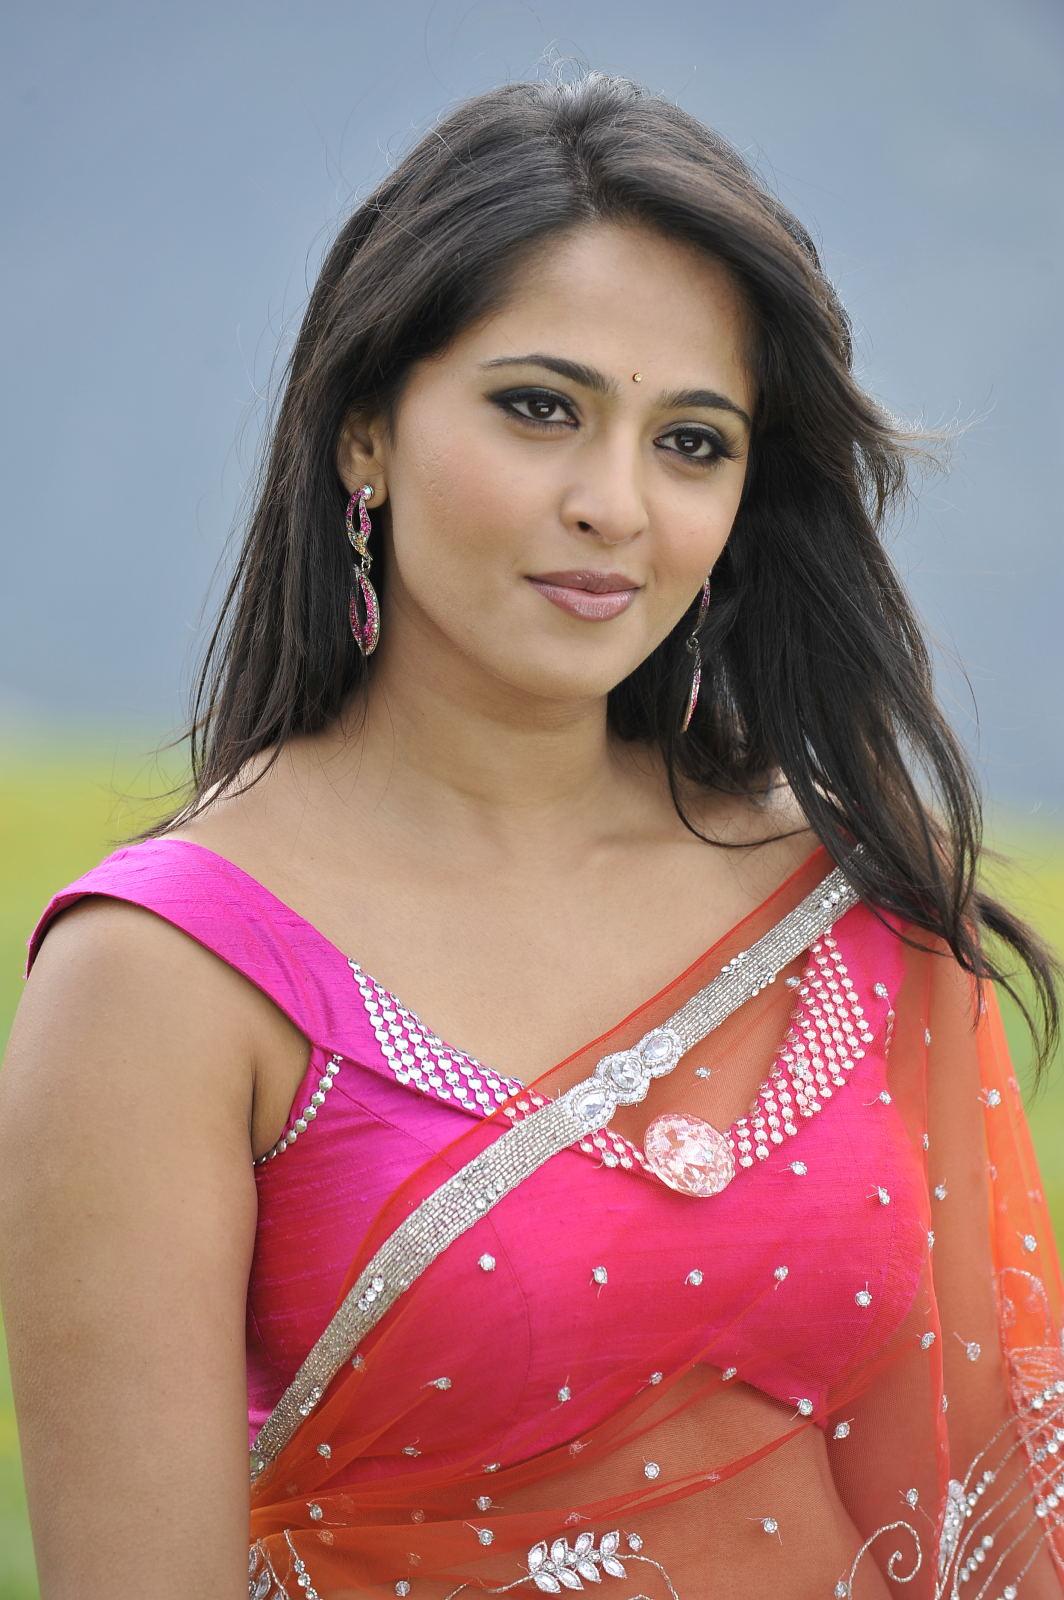 Anushka Shetty Hot Photos In Red Saree 2016